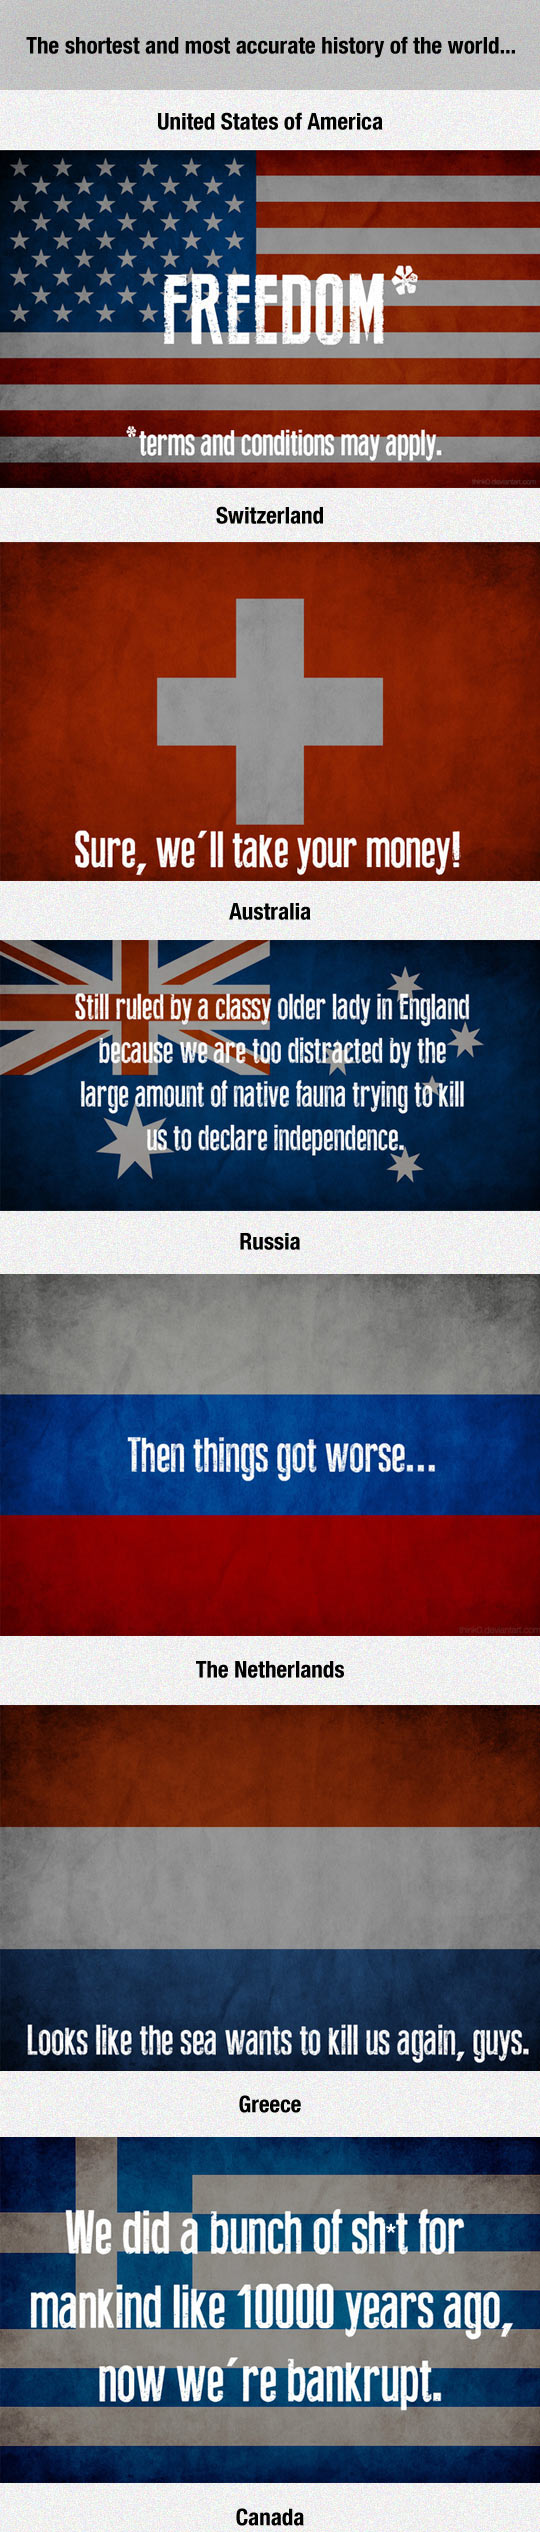 funny-flag-history-slogan-countries